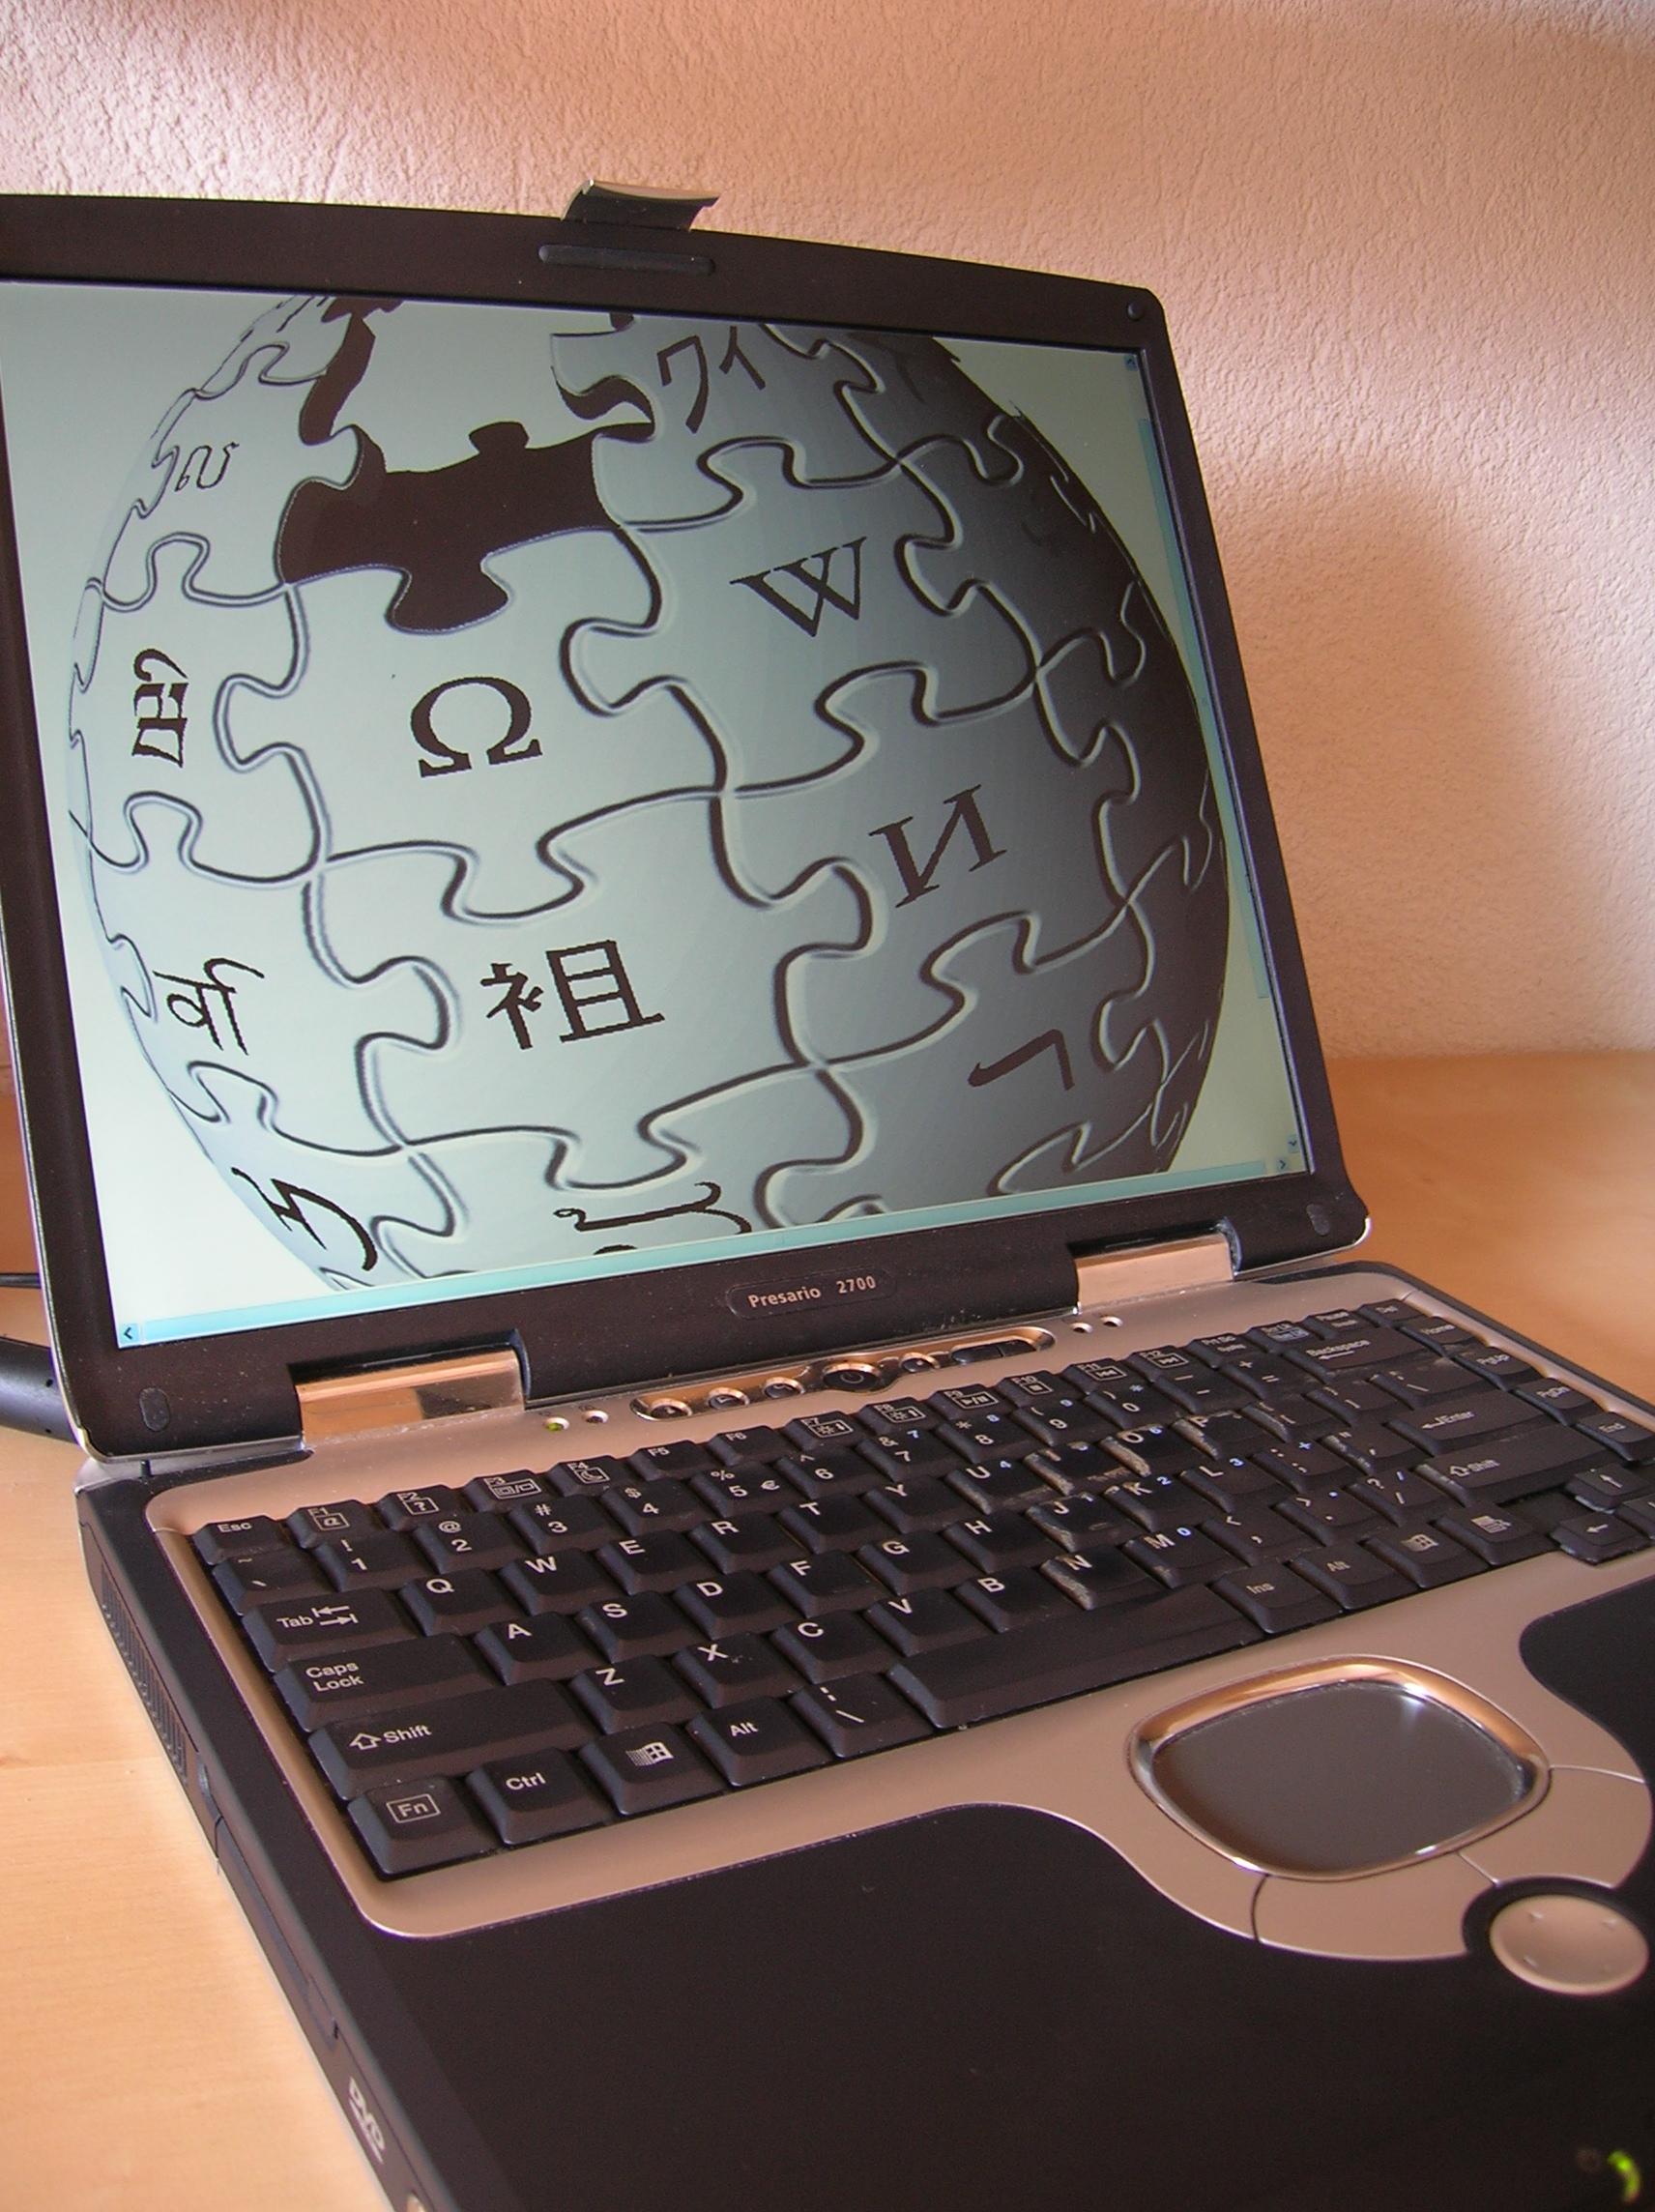 USB 2.0 Wireless WiFi Lan Card for HP-Compaq Presario SR1000V Series